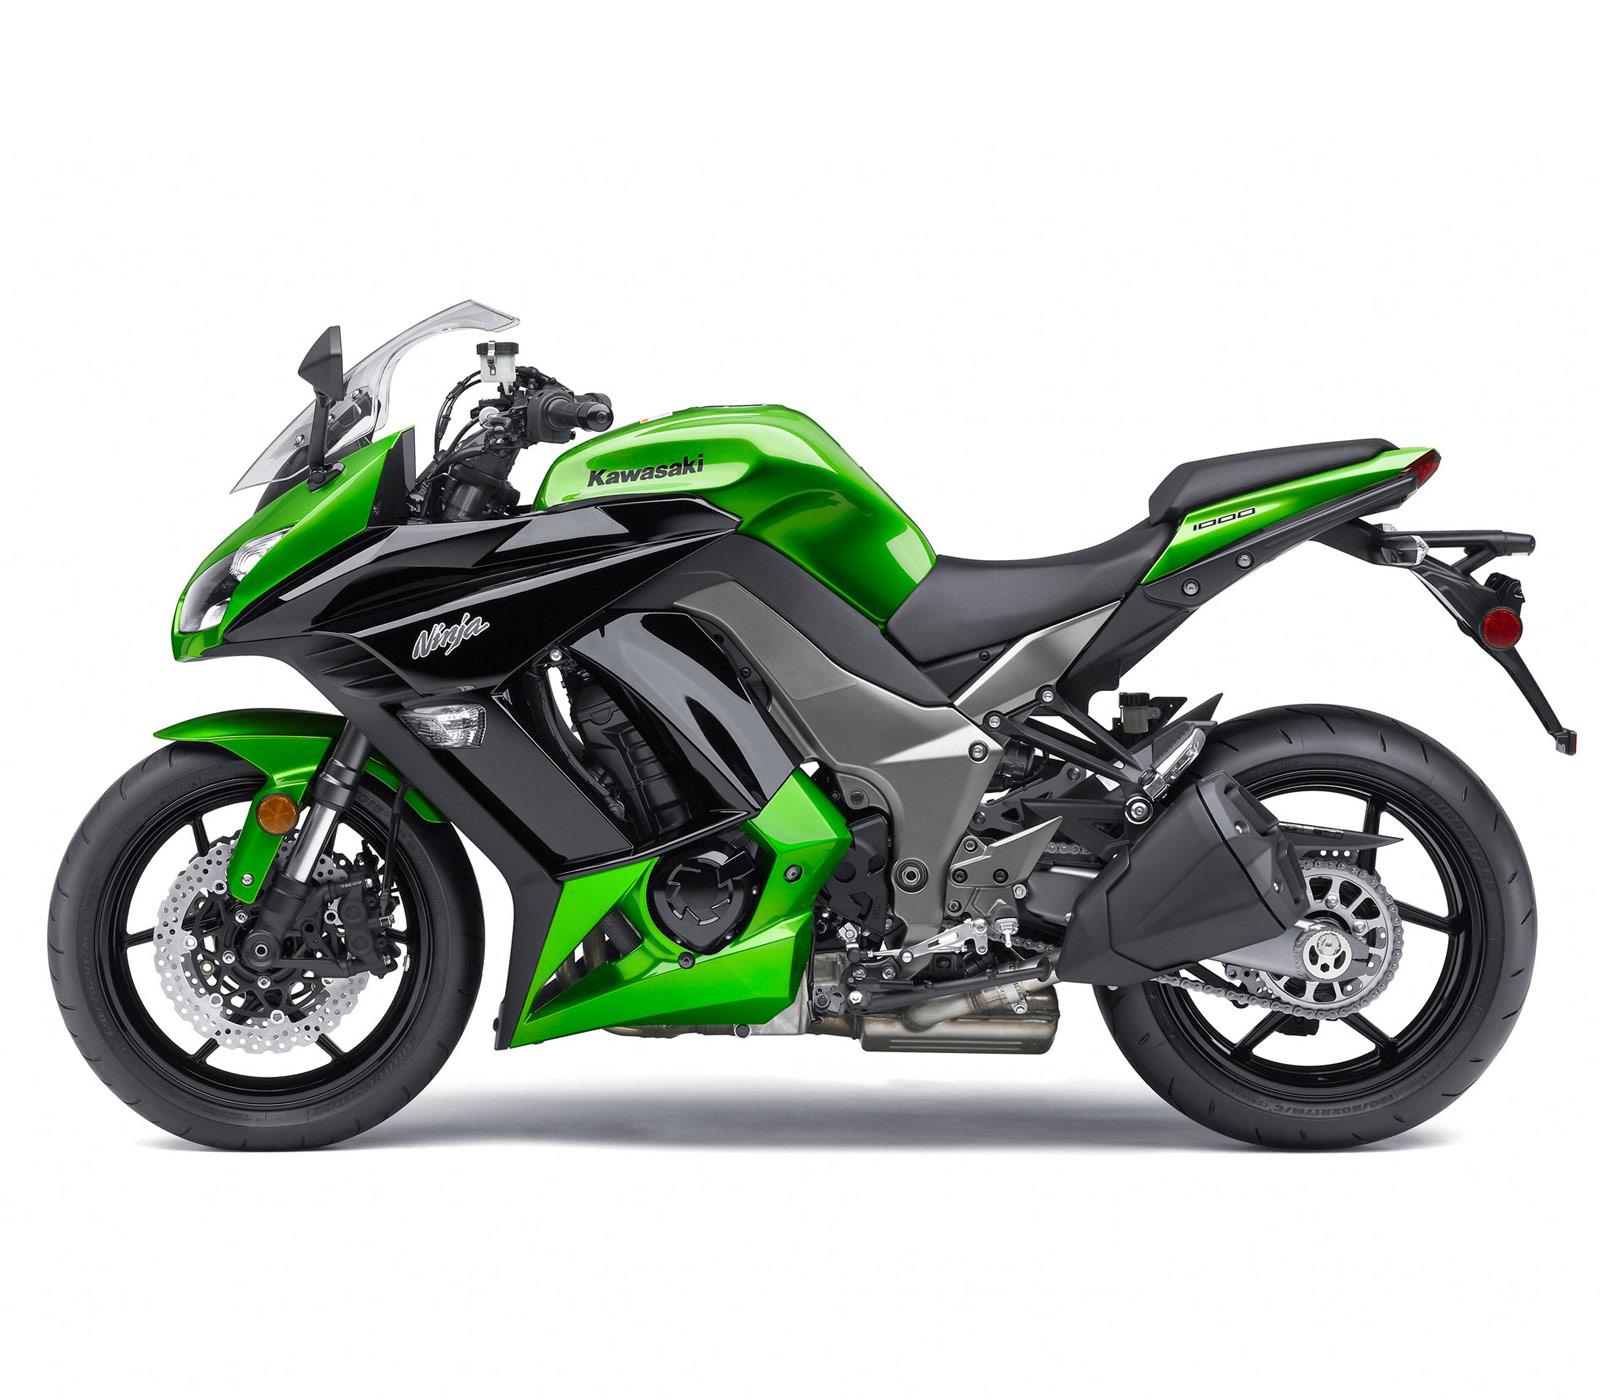 http://3.bp.blogspot.com/-QCRXTCtxPS0/TwwM8EQMVxI/AAAAAAAAKE0/AAXmmcmq6ZY/s1600/2012-Kawasaki-Ninja-1000-ABS_motorcycle-desktop-wallpaper_2.jpg